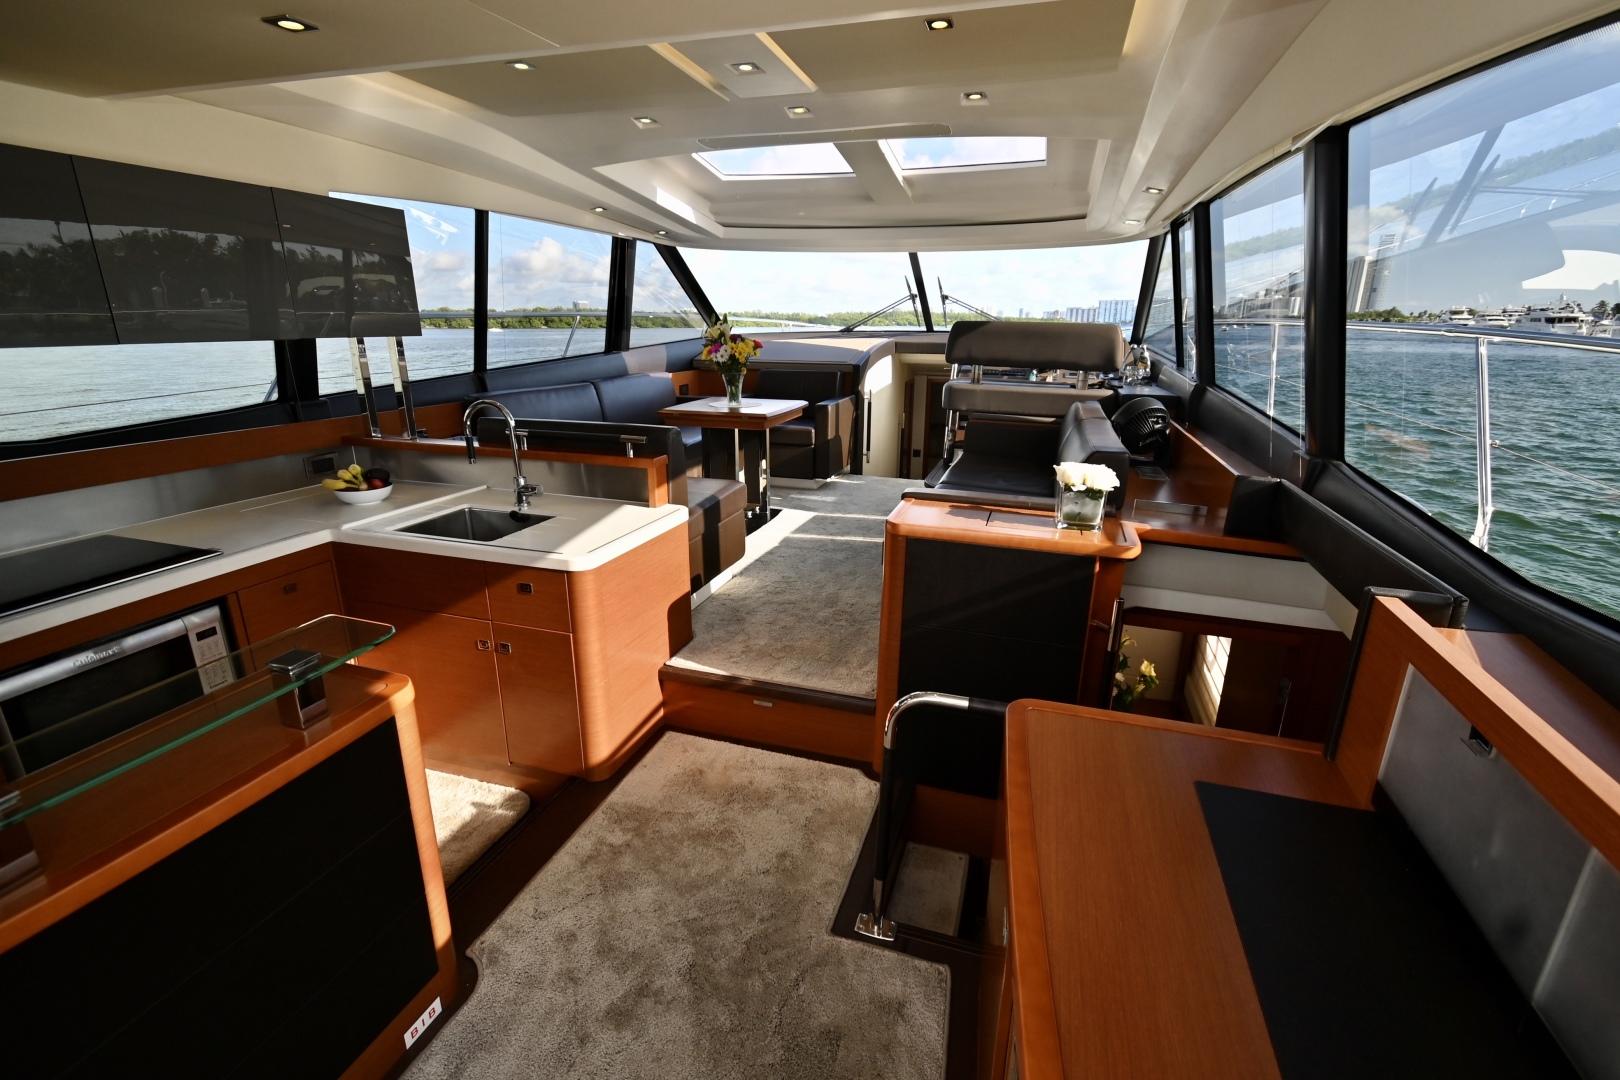 Prestige-550S 2015-Nolina II Hollywood-Florida-United States-1479461 | Thumbnail